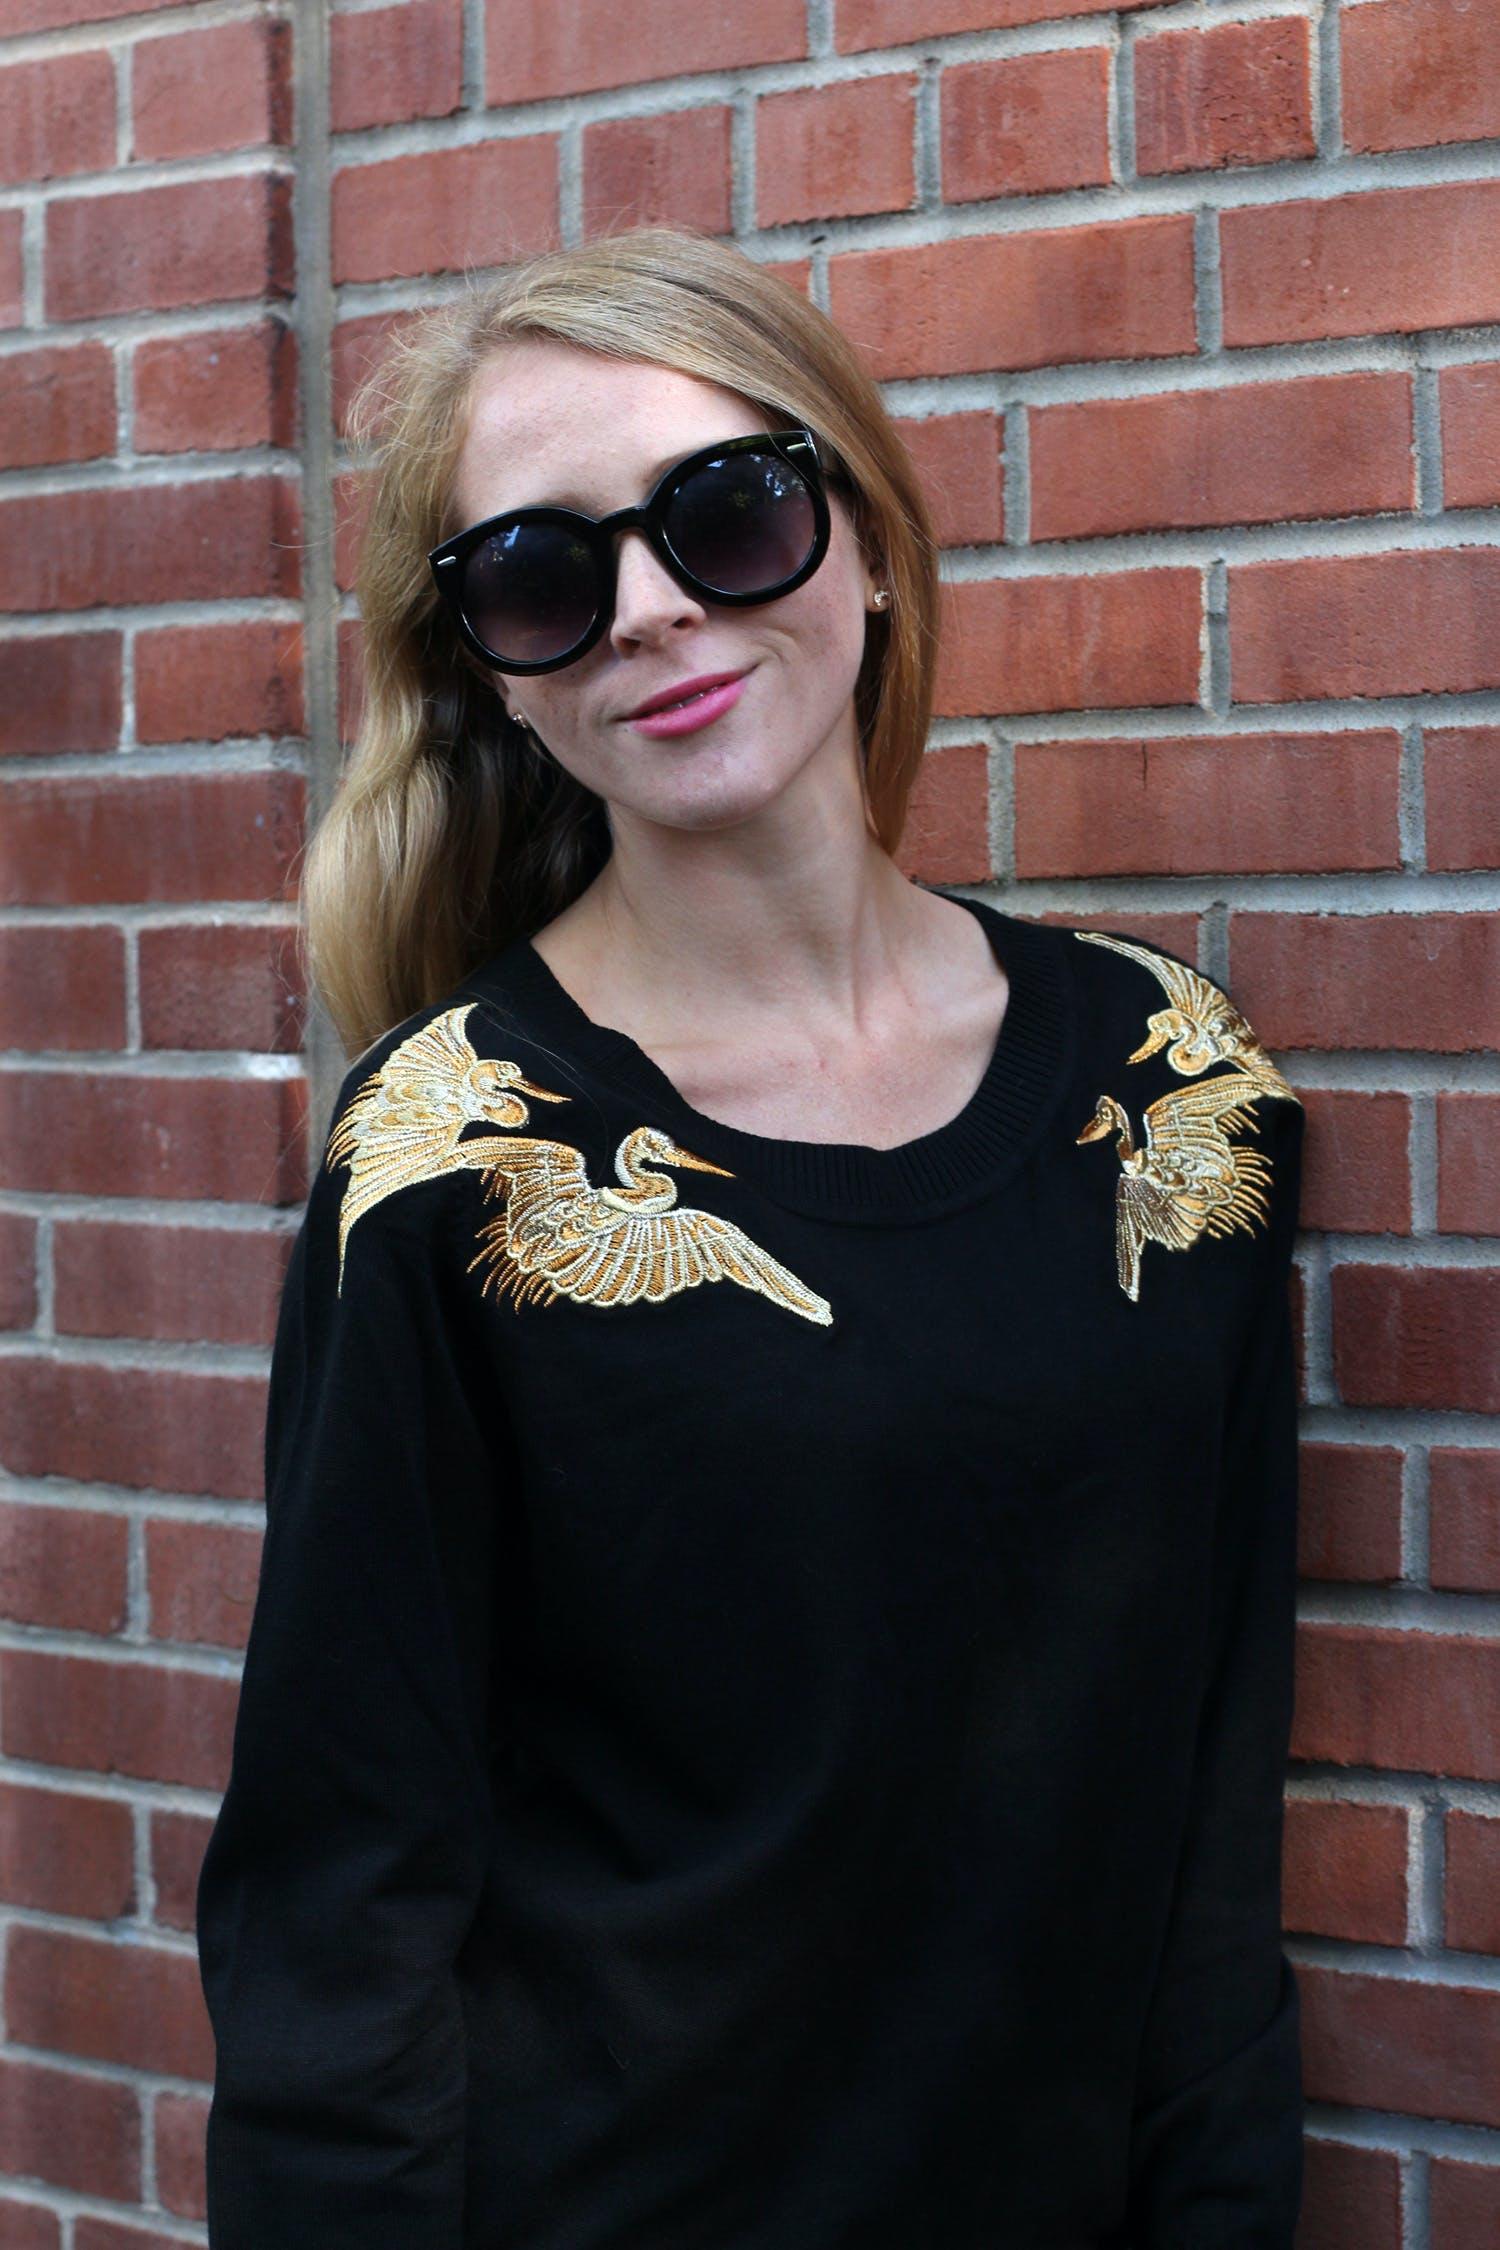 Altuzarra for Target Crane sweater: How I wore it + Review